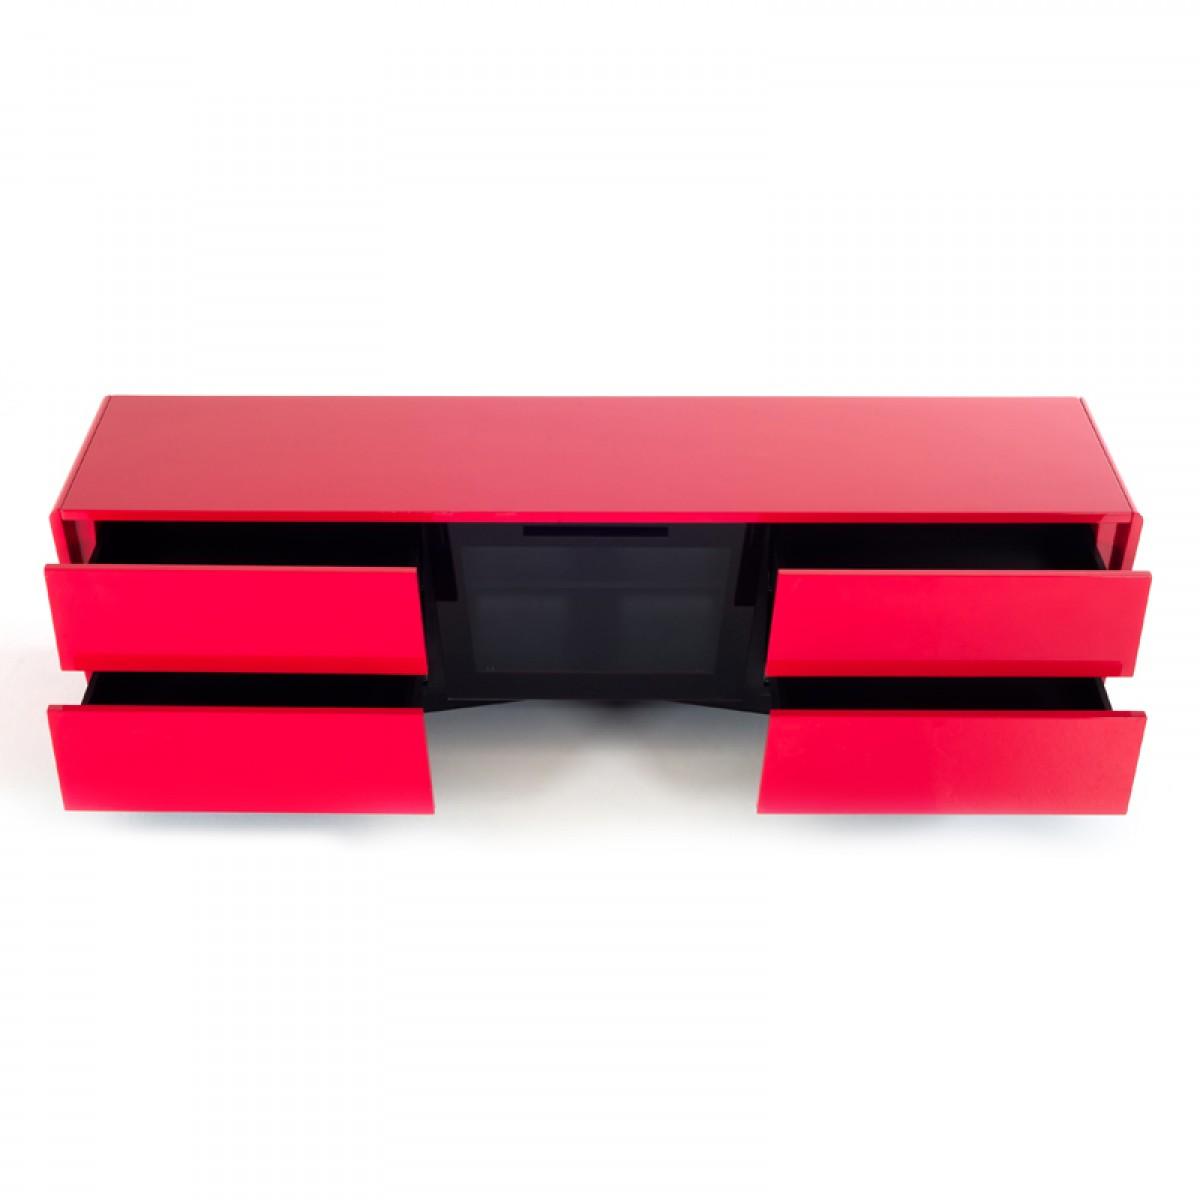 Red Lacquer TV Console Corner Unit on Legs Chicago Illinois VIG